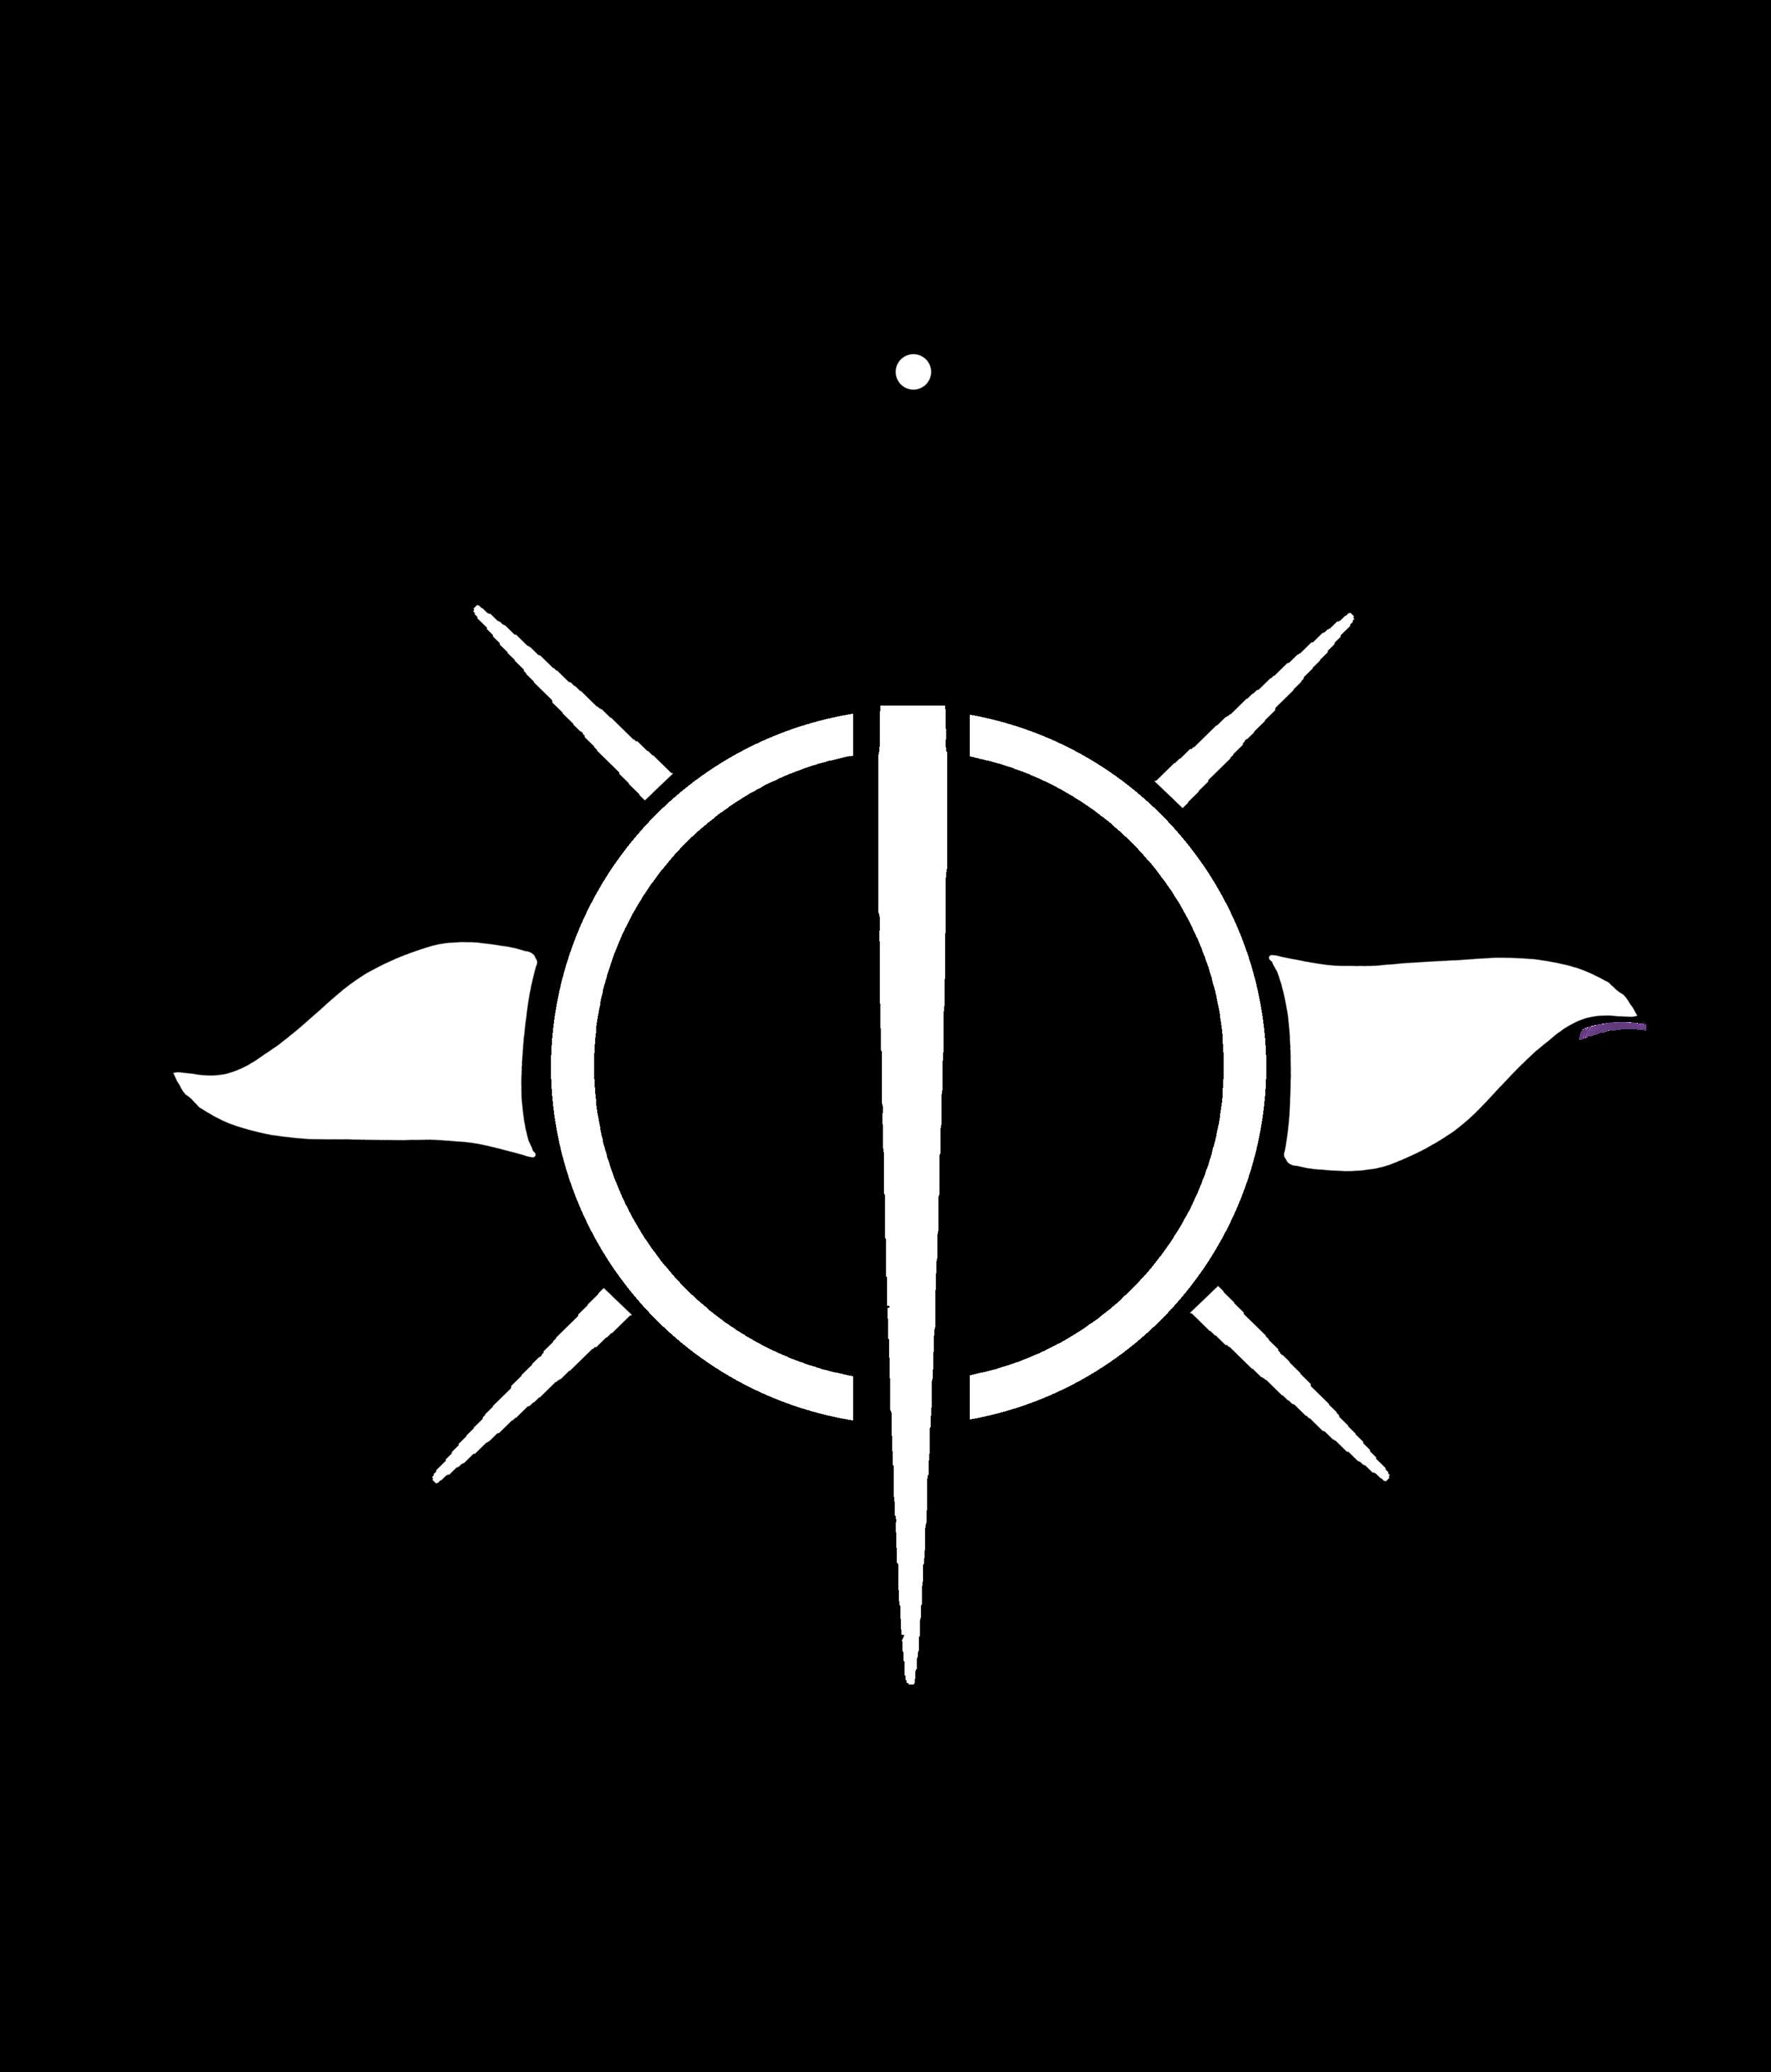 Silent One Symbol